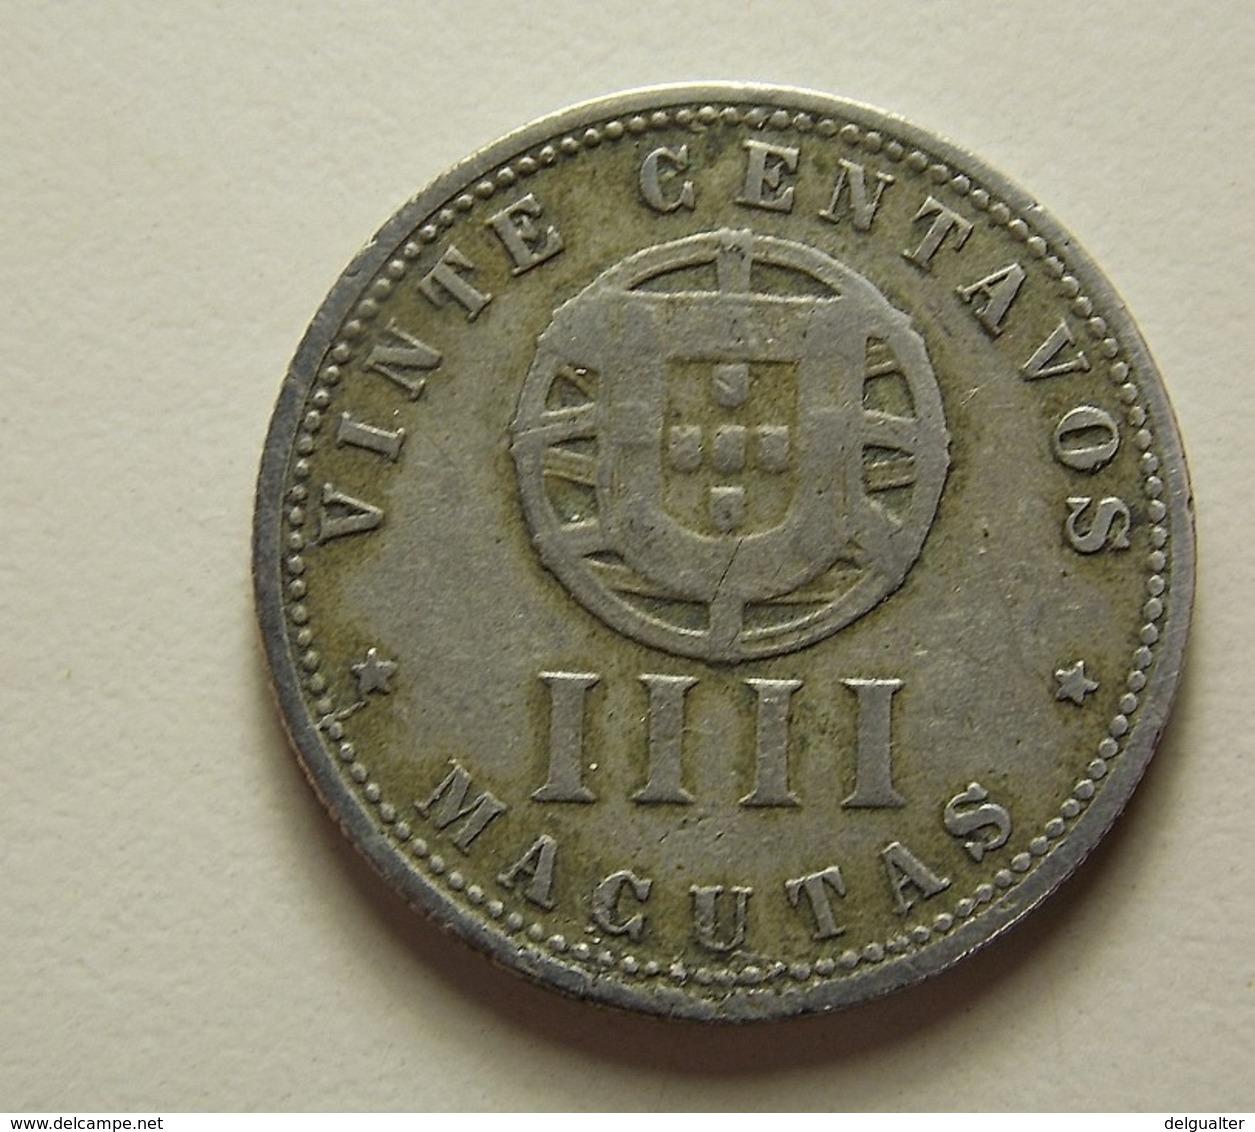 Portugal Angola IIII Macutas 1927 - Portugal